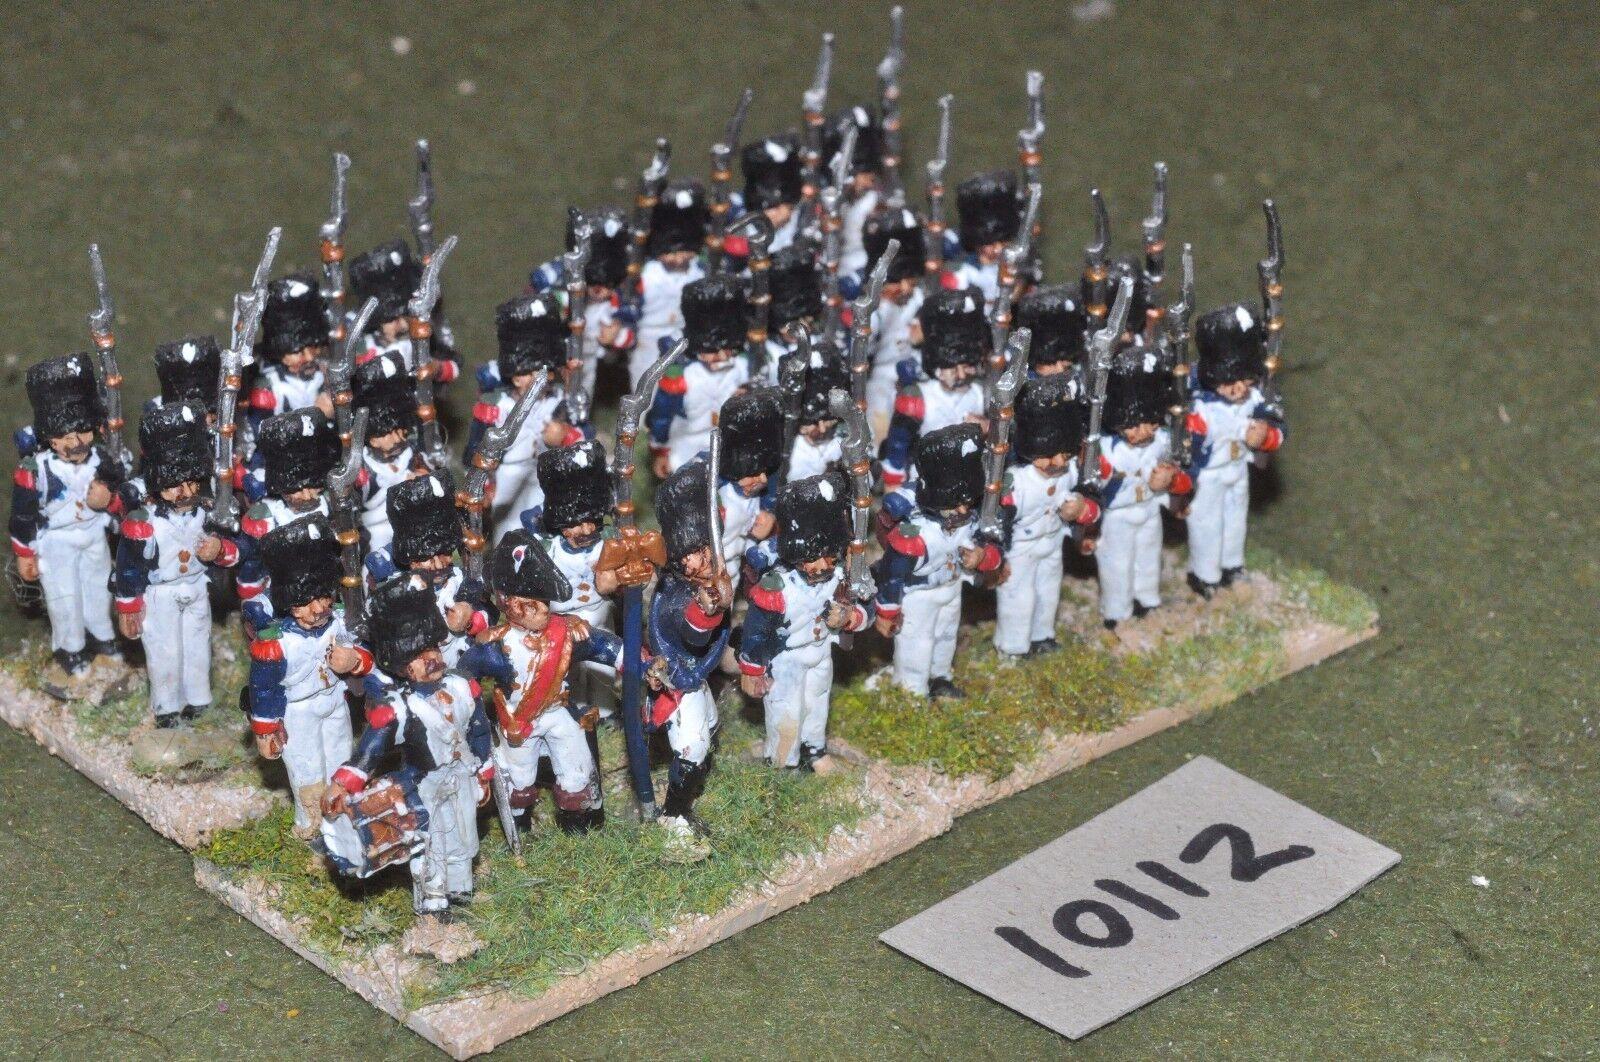 25mm Infantería Napoleónicas francés - 32 figuras-INF (10112)